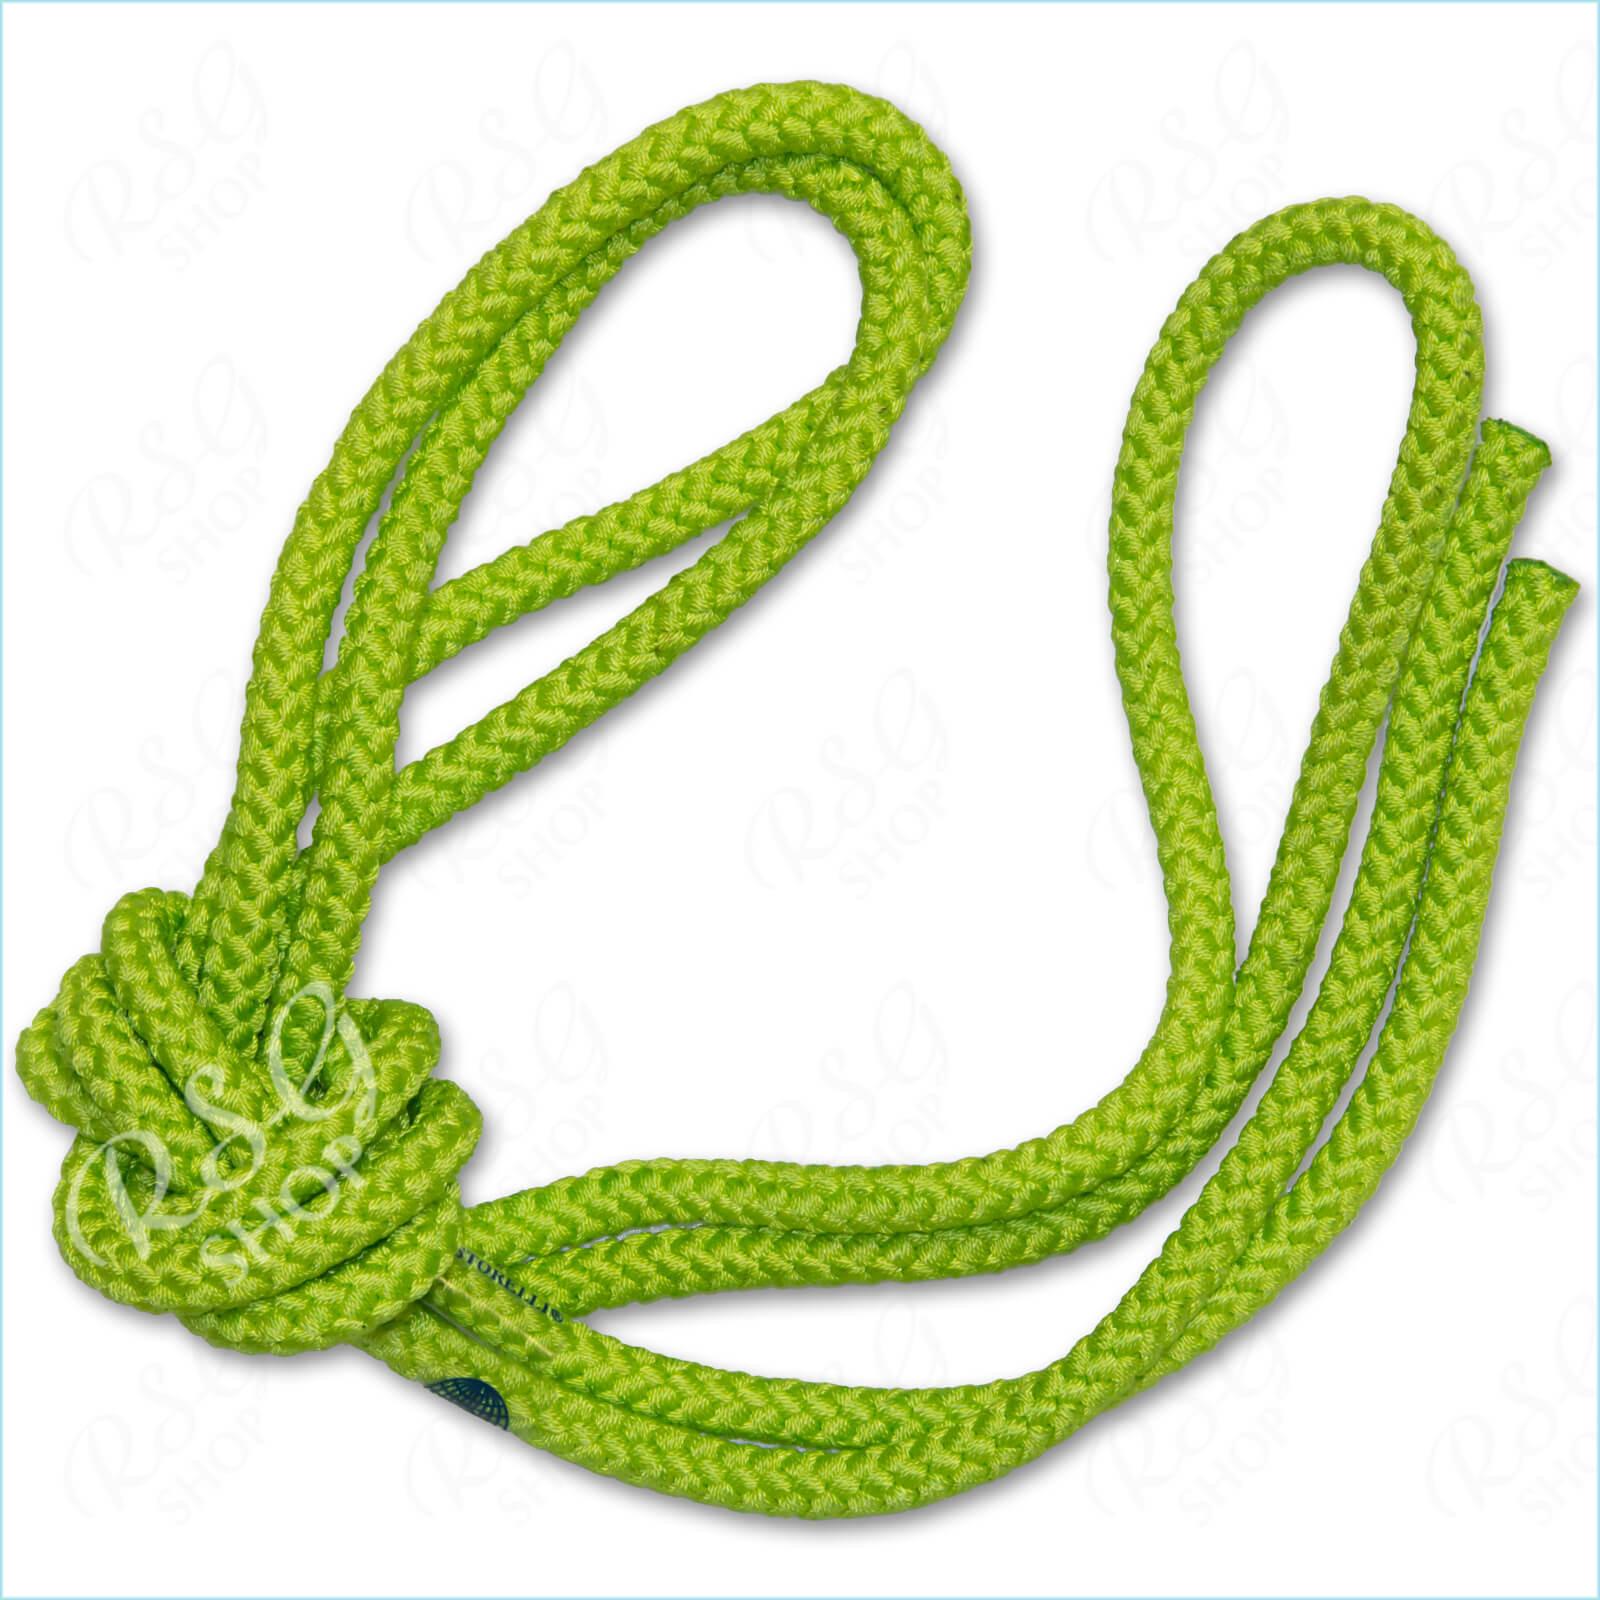 Скакалка 3м Pastorelli Patrasso цвет Зеленый FIG Артикул 00146